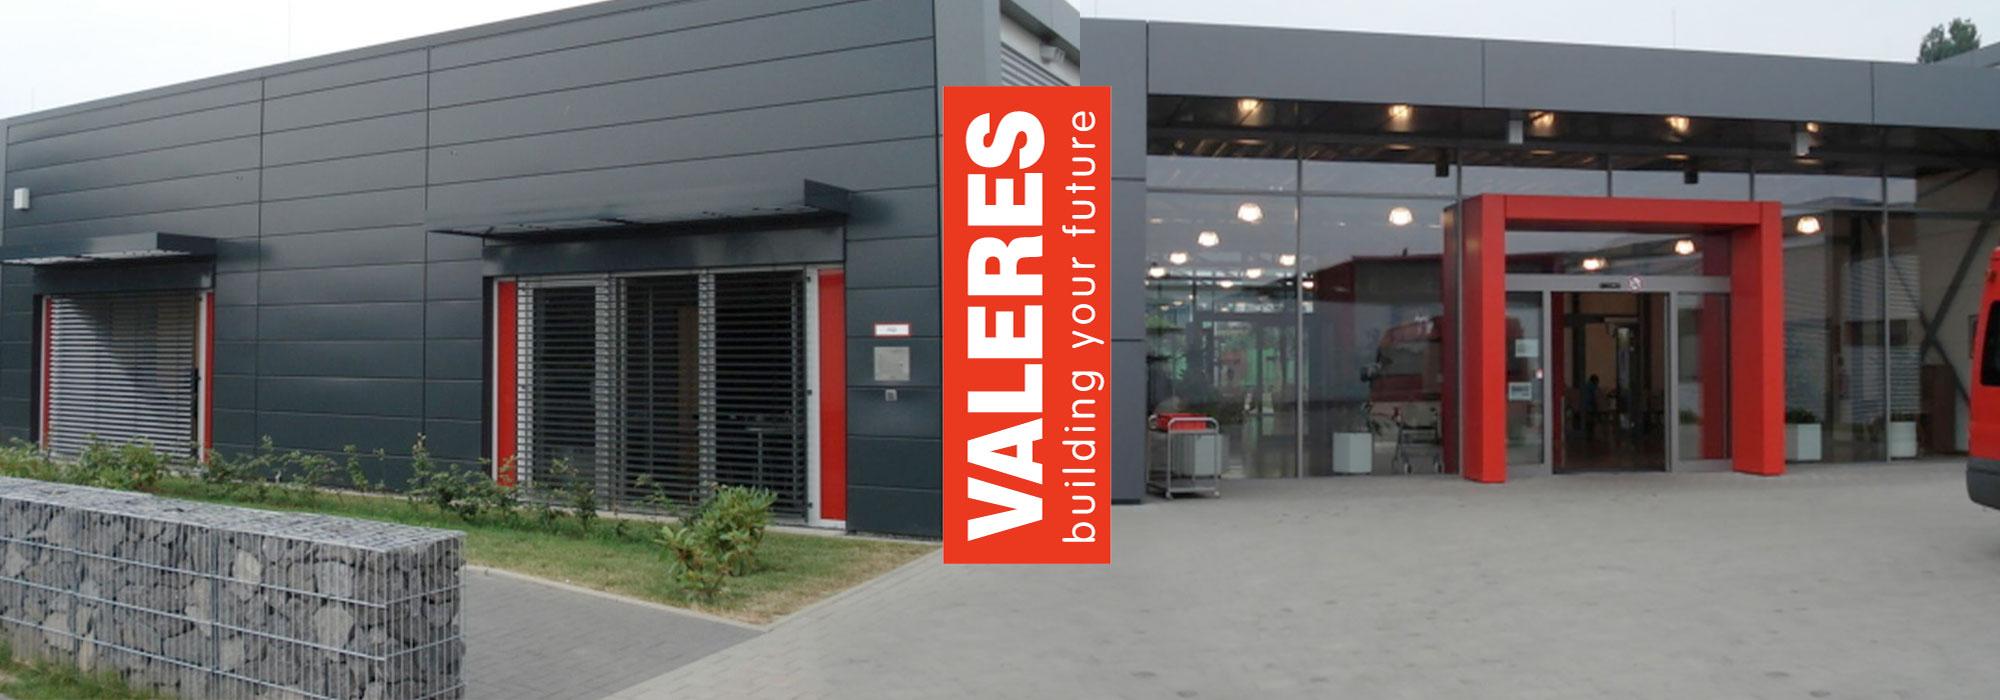 Header Generalunternehmern Valeres Analyse Betonbau